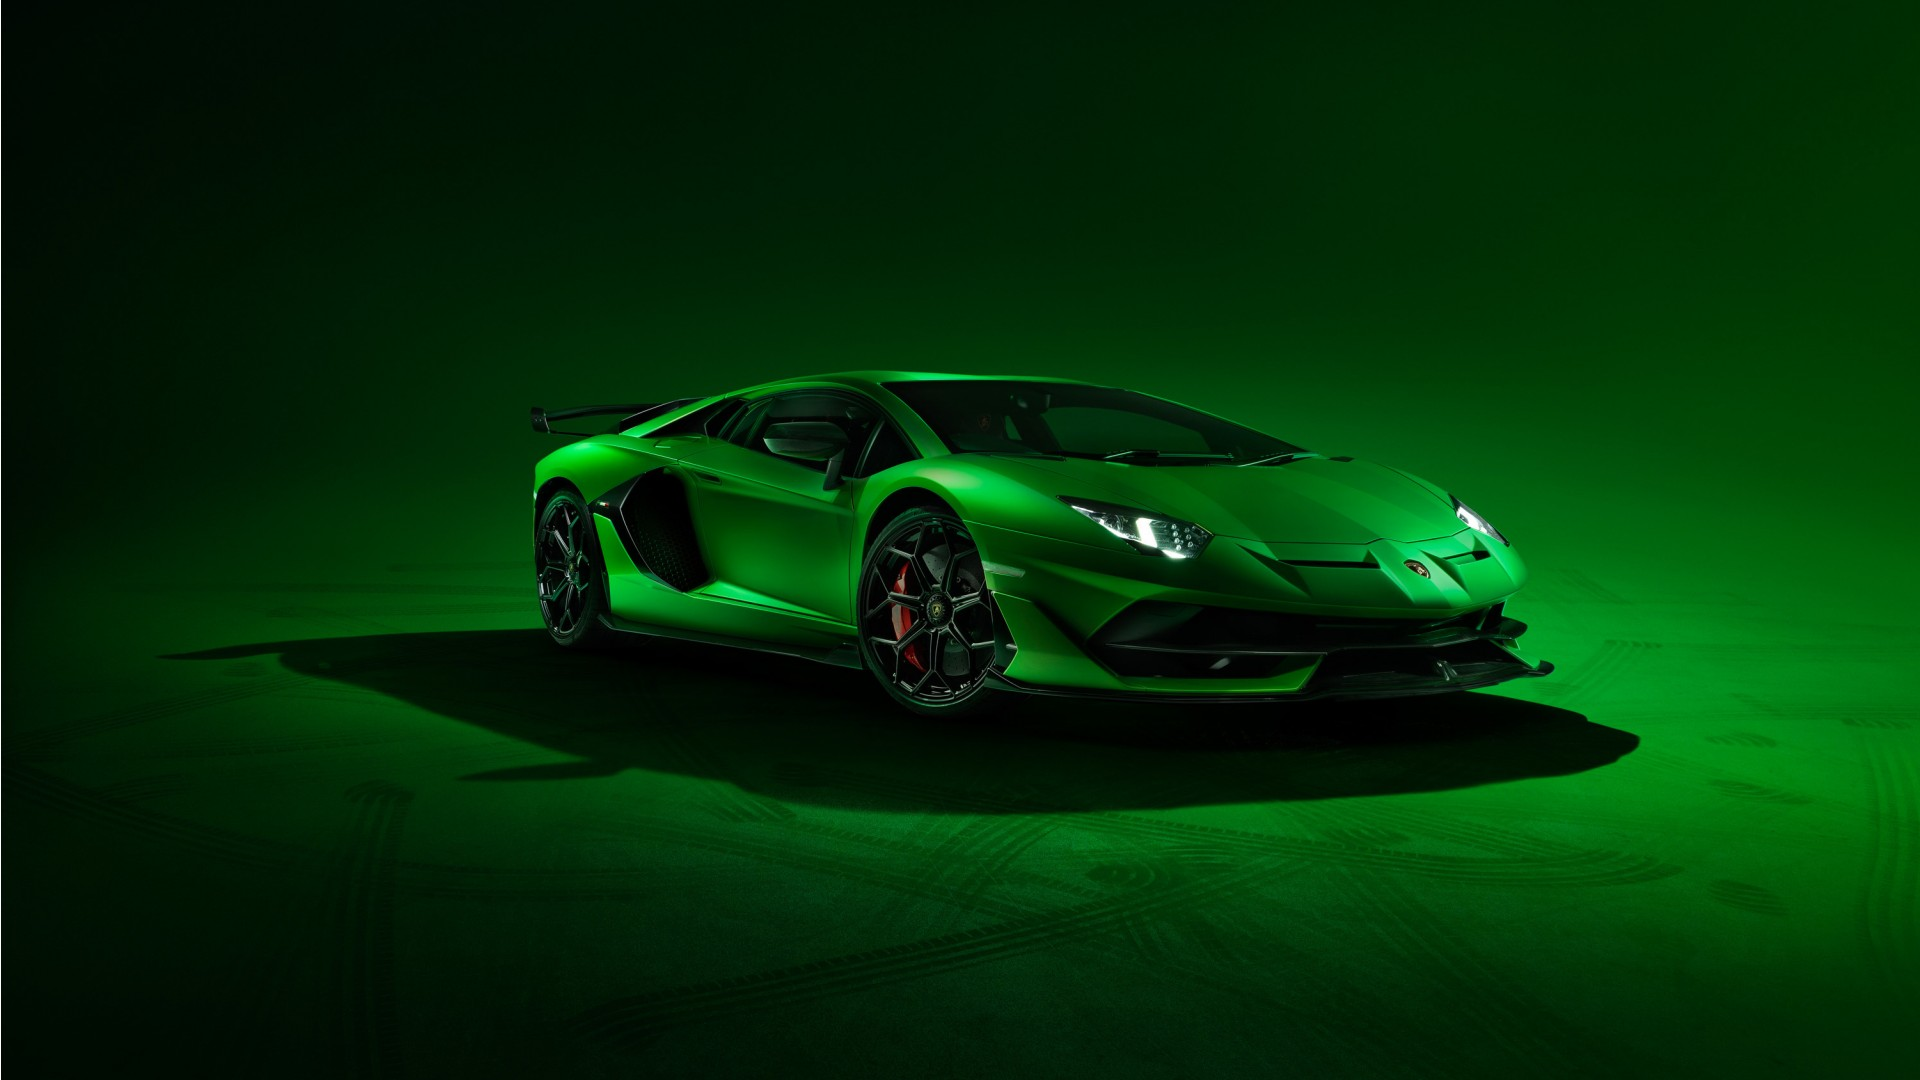 2019 Lamborghini Aventador SVJ Wallpaper | HD Car ...